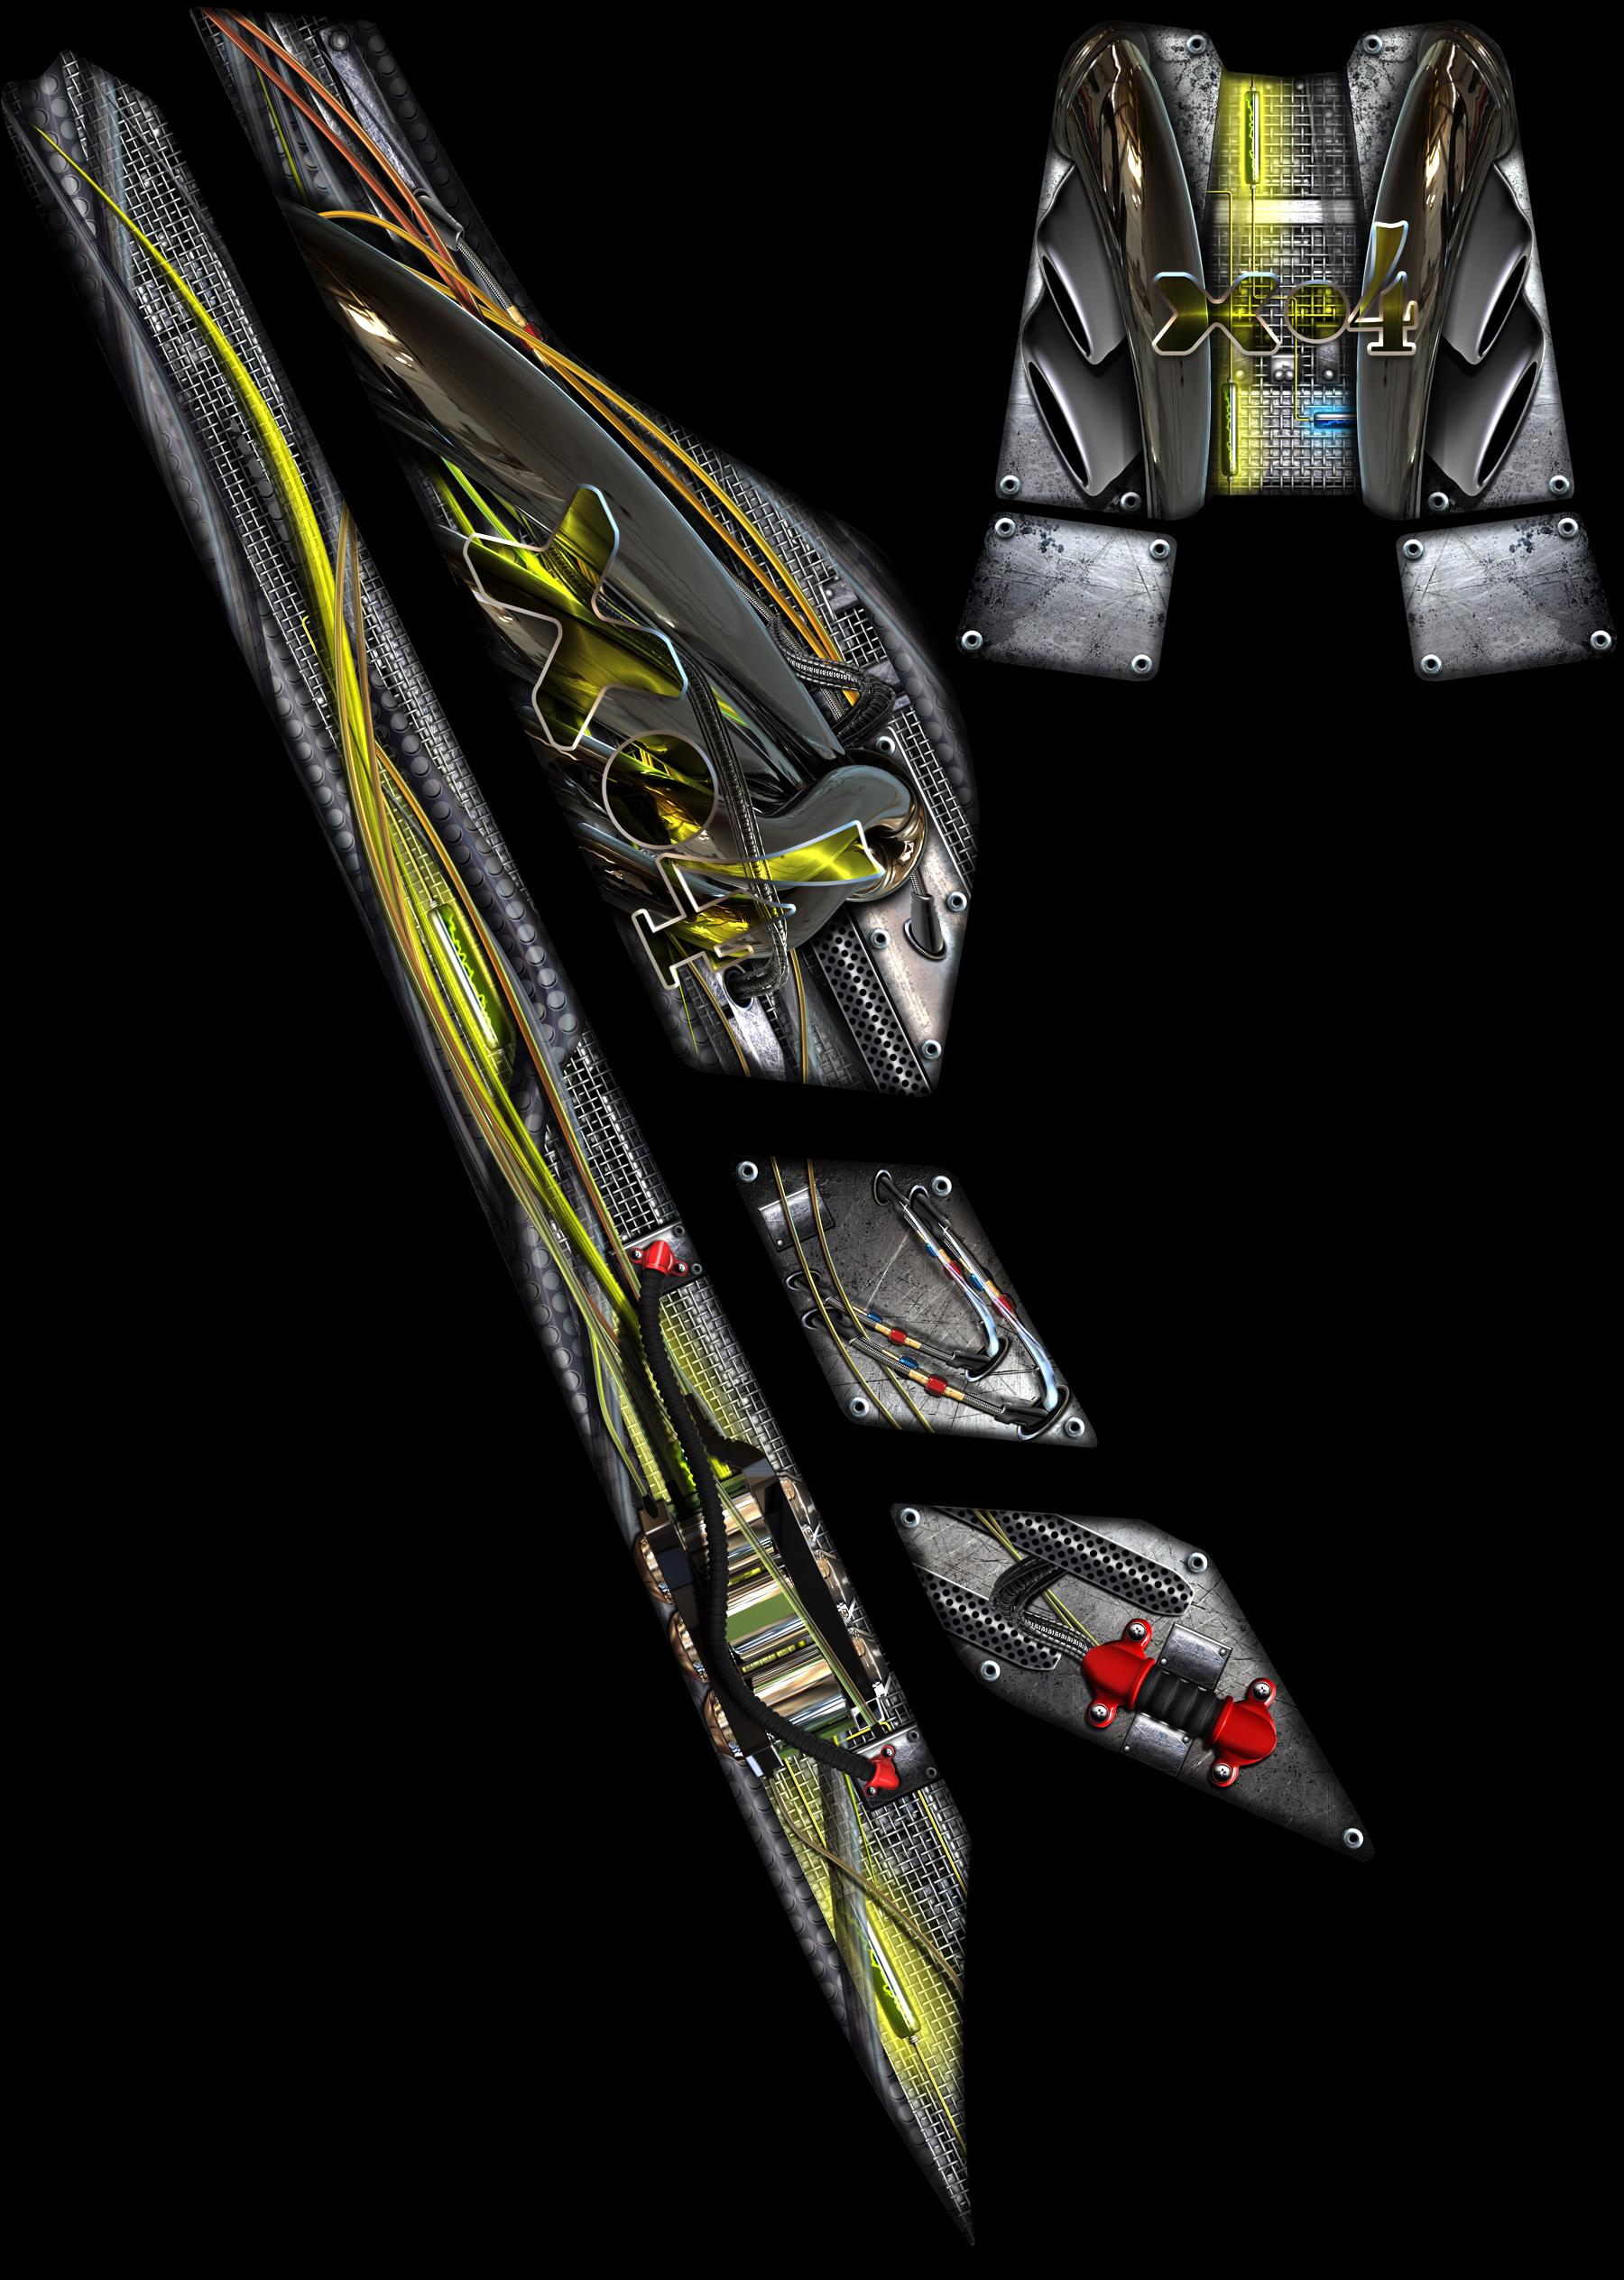 1996 Seadoo Xp >> Seadoo XP The 'XFORMER' design graphics.